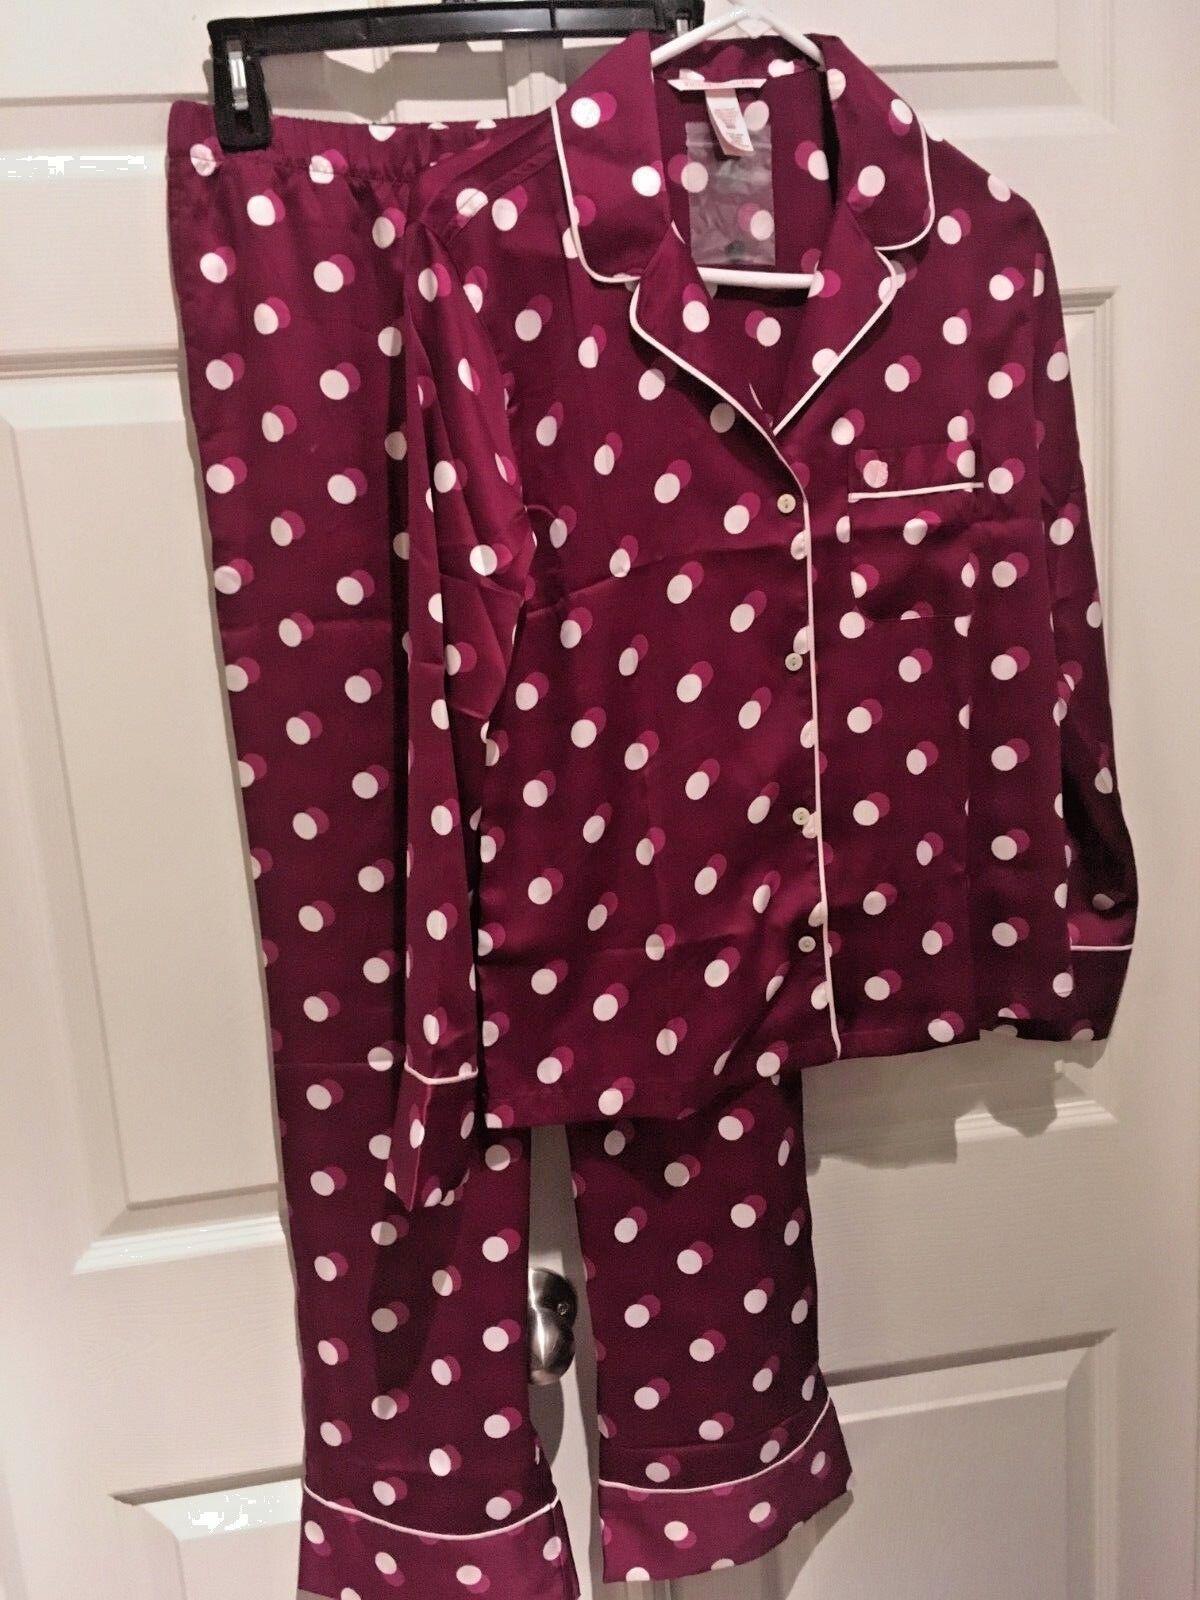 NEW Victoria Secret Satin Afterhours Pajama SET Pants Dot Kir pj S L XL Short